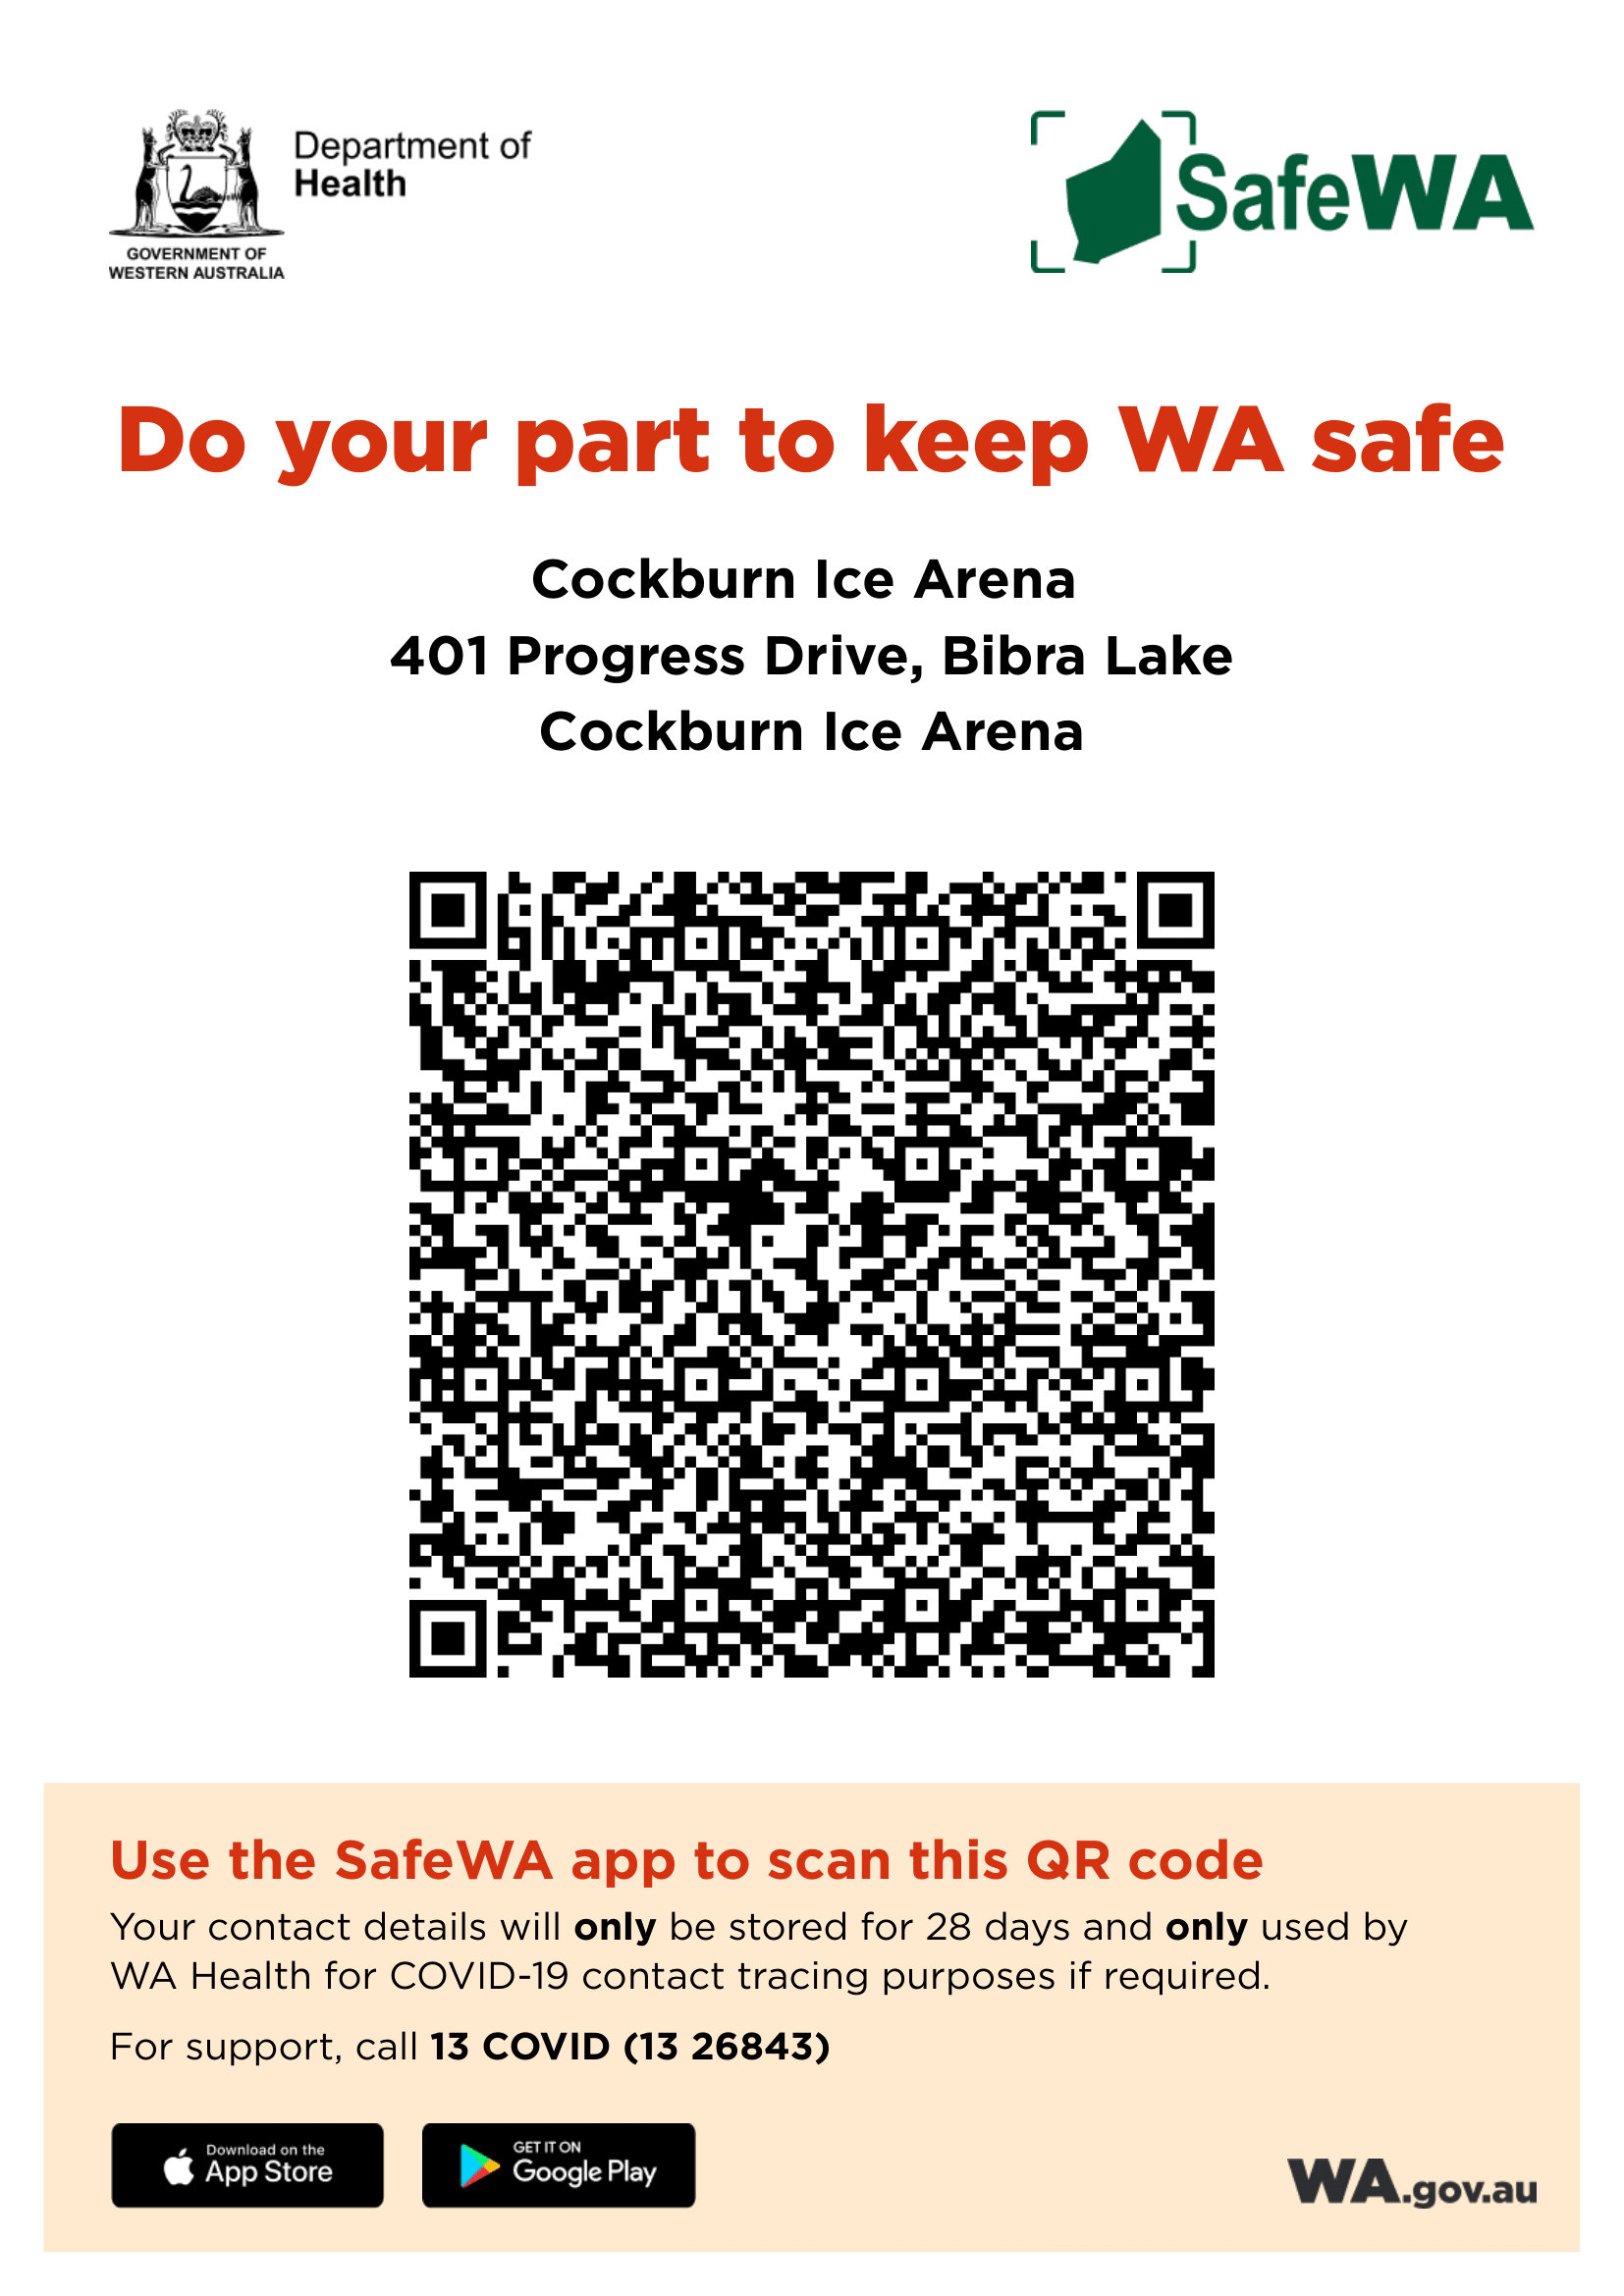 SAFEWA covid QR scanning page